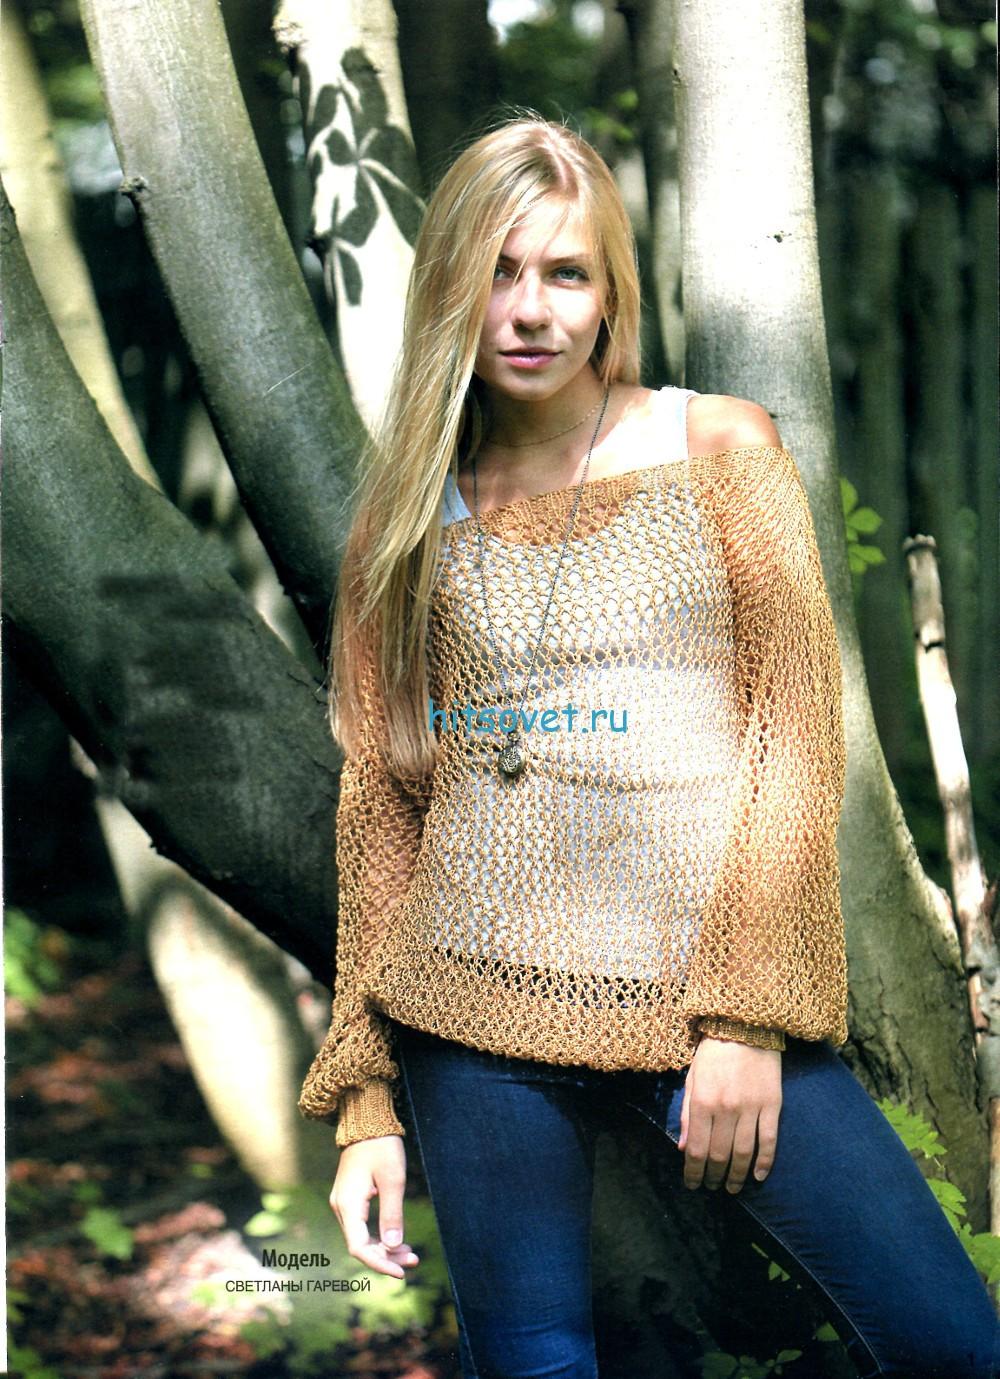 Сетчатый пуловер из вискозы